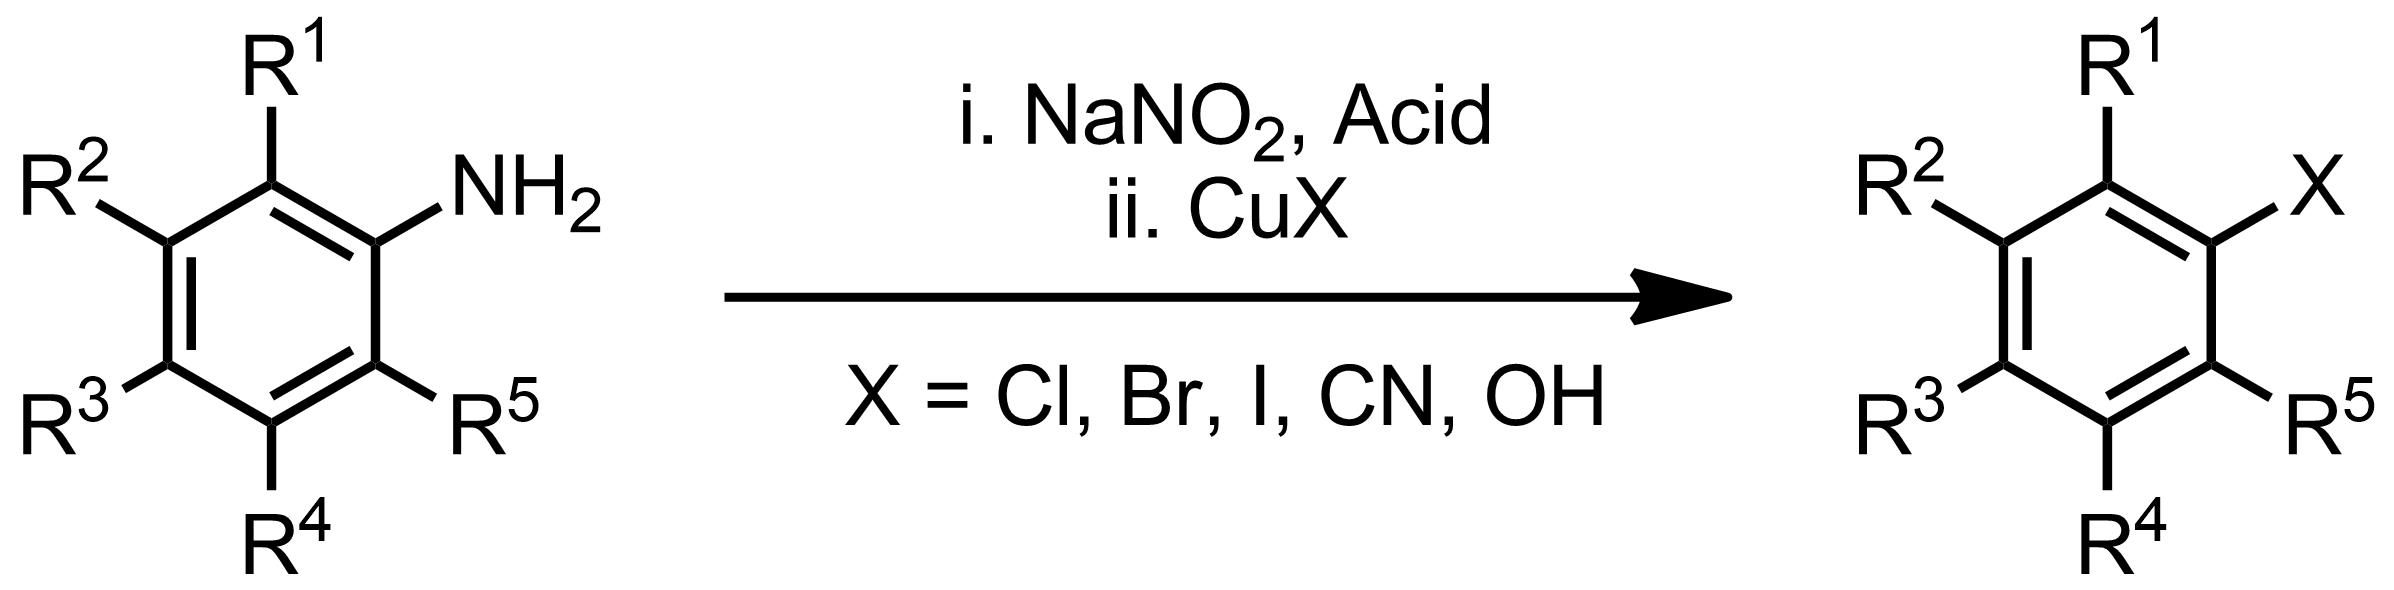 Schematic representation of the Sandmeyer Reaction.